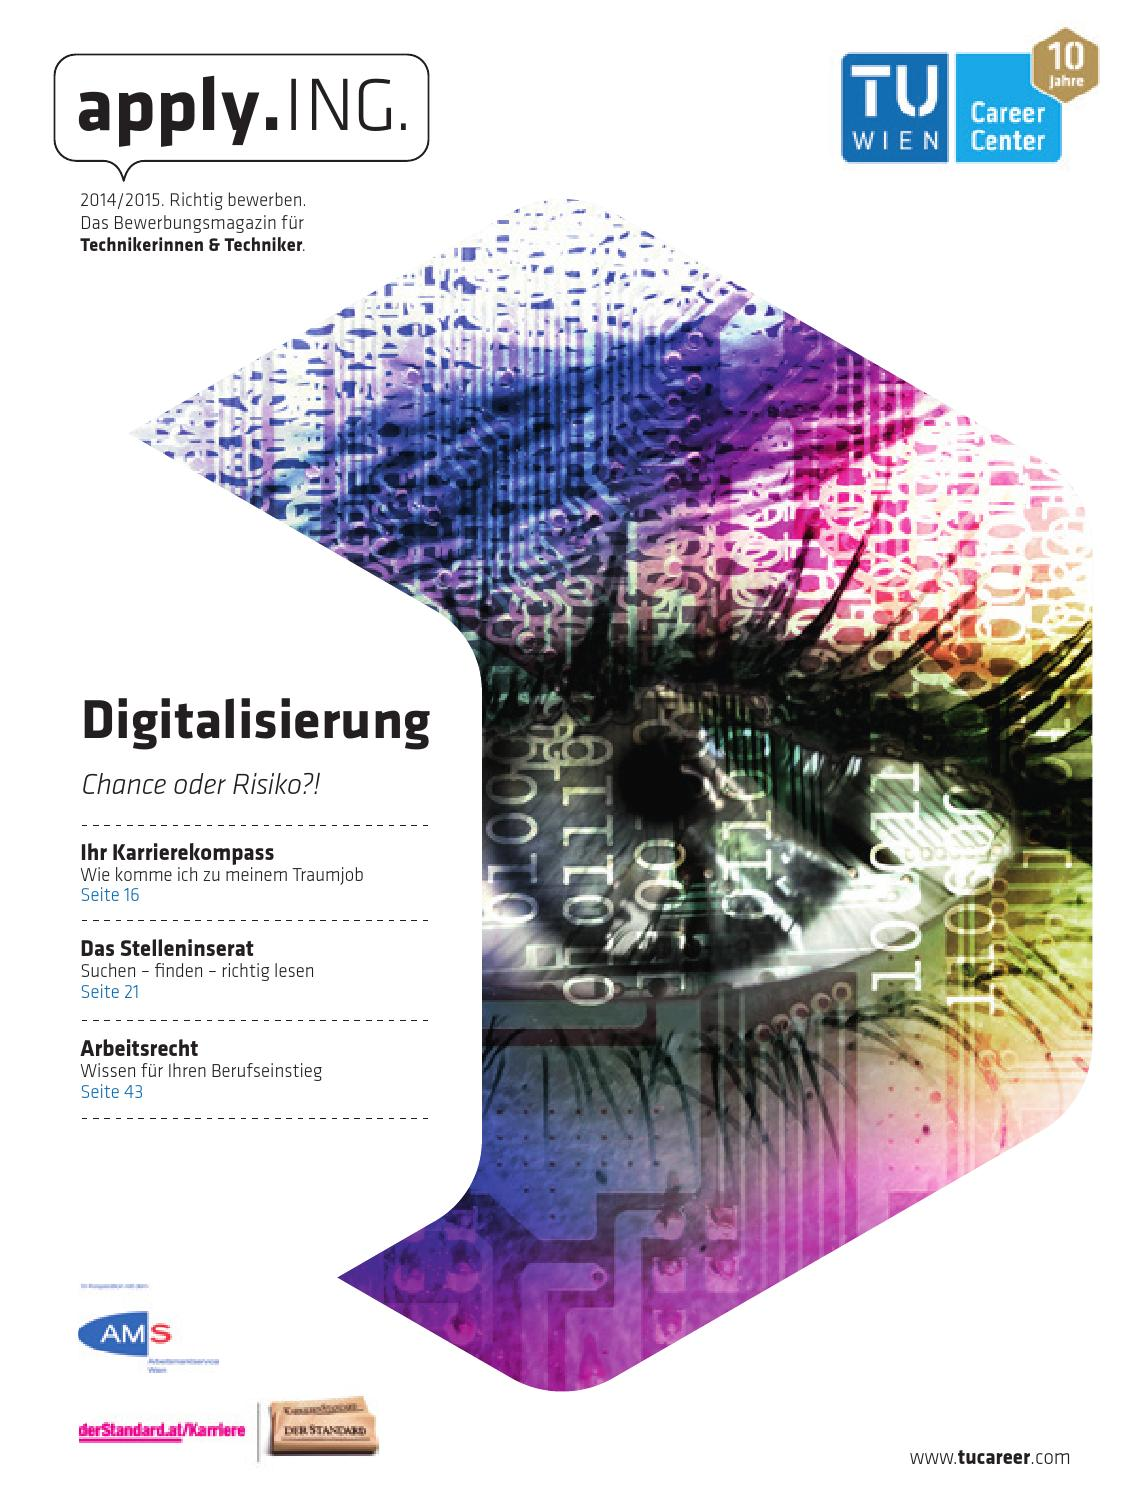 apply.ING. - Das Bewerbungsmagazin 2014/15 by TU Career Center GmbH - issuu